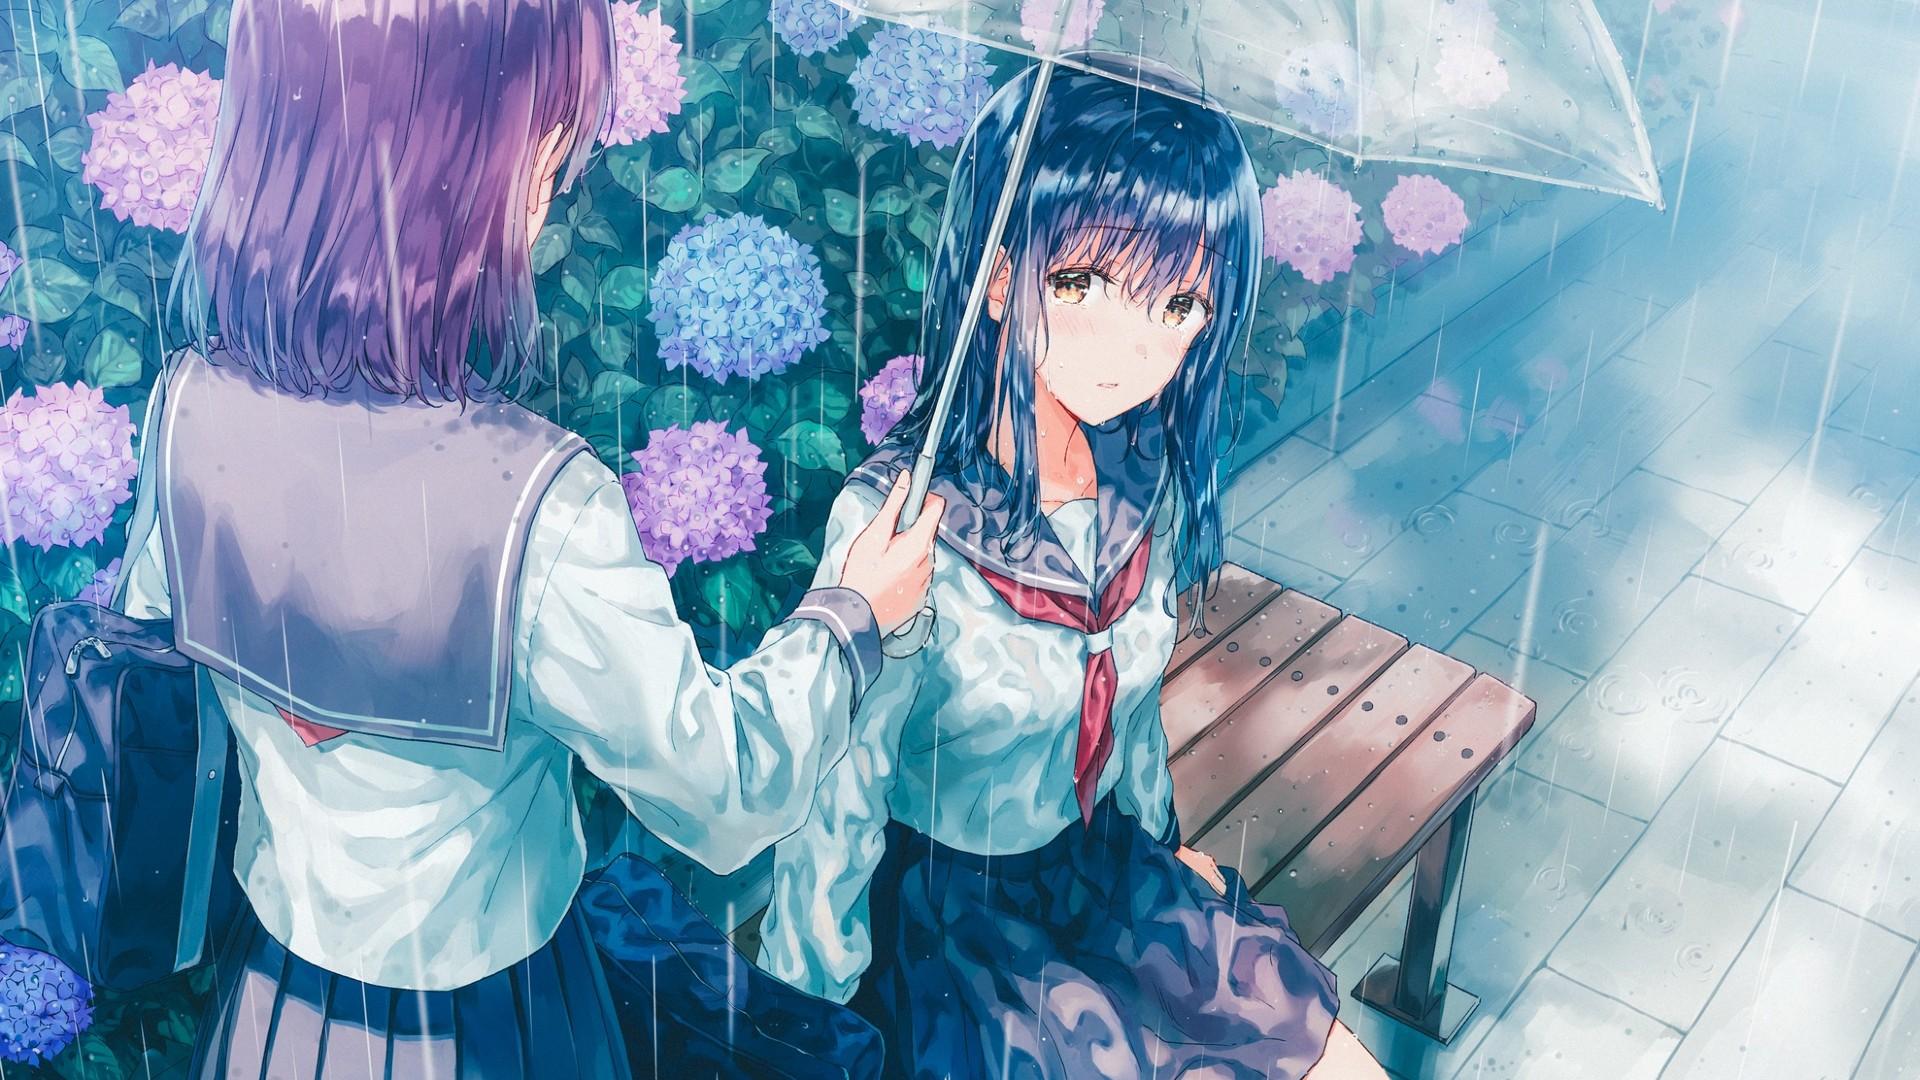 Umbrella Anime Girls Bench Black Hair Hydrangea Rain Anime Wallpaper Resolution 1920x1080 Id 702880 Wallha Com